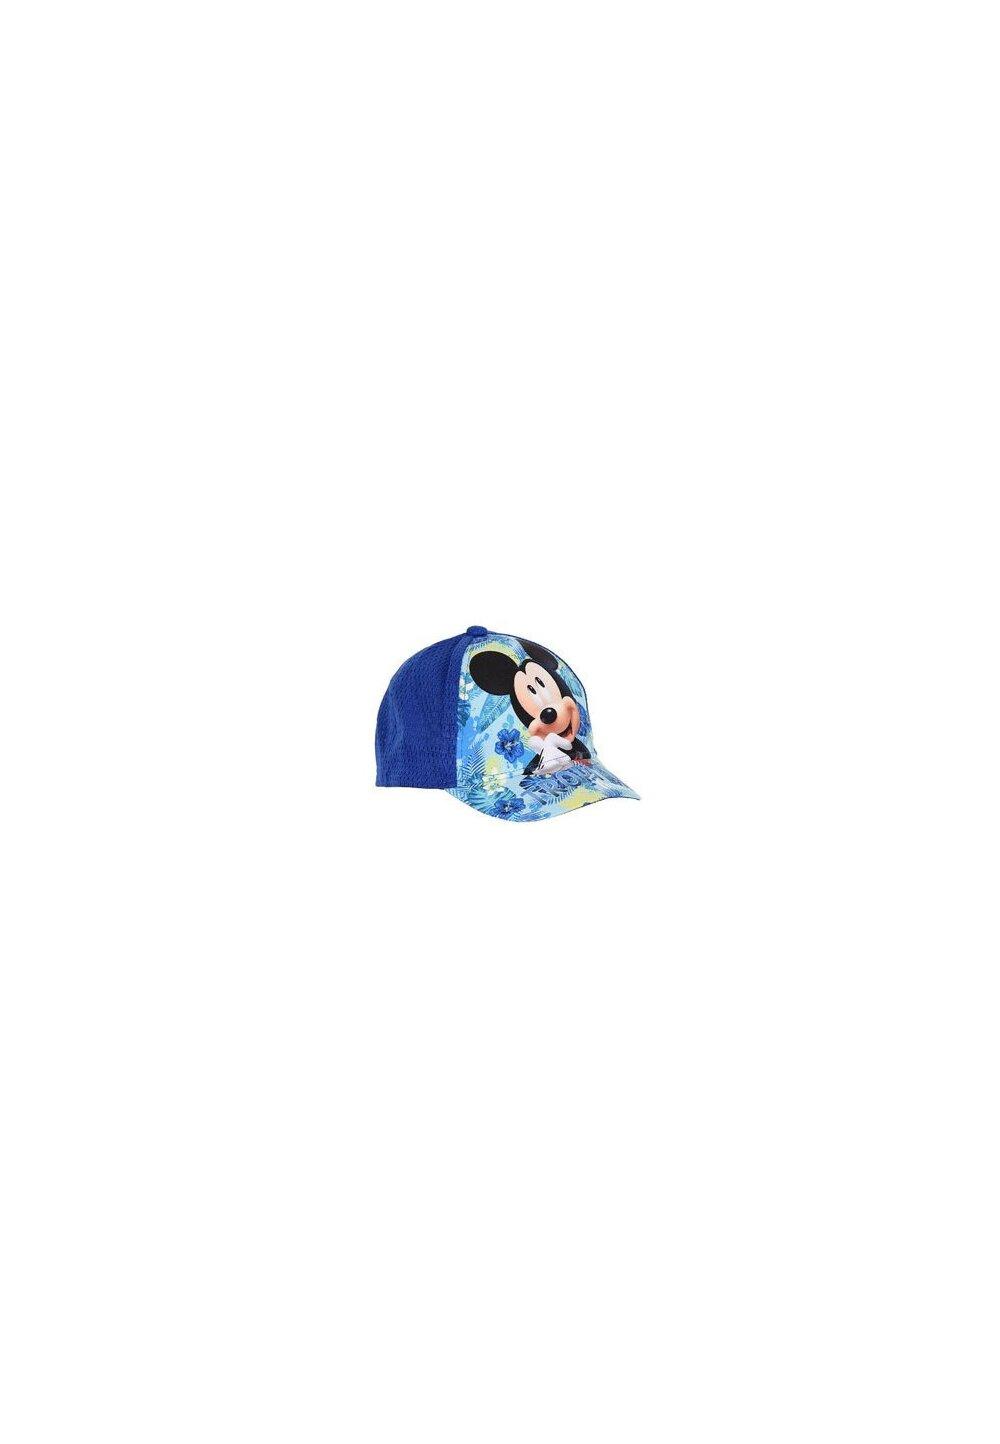 Sapca, Tropical pasadise, albastra imagine